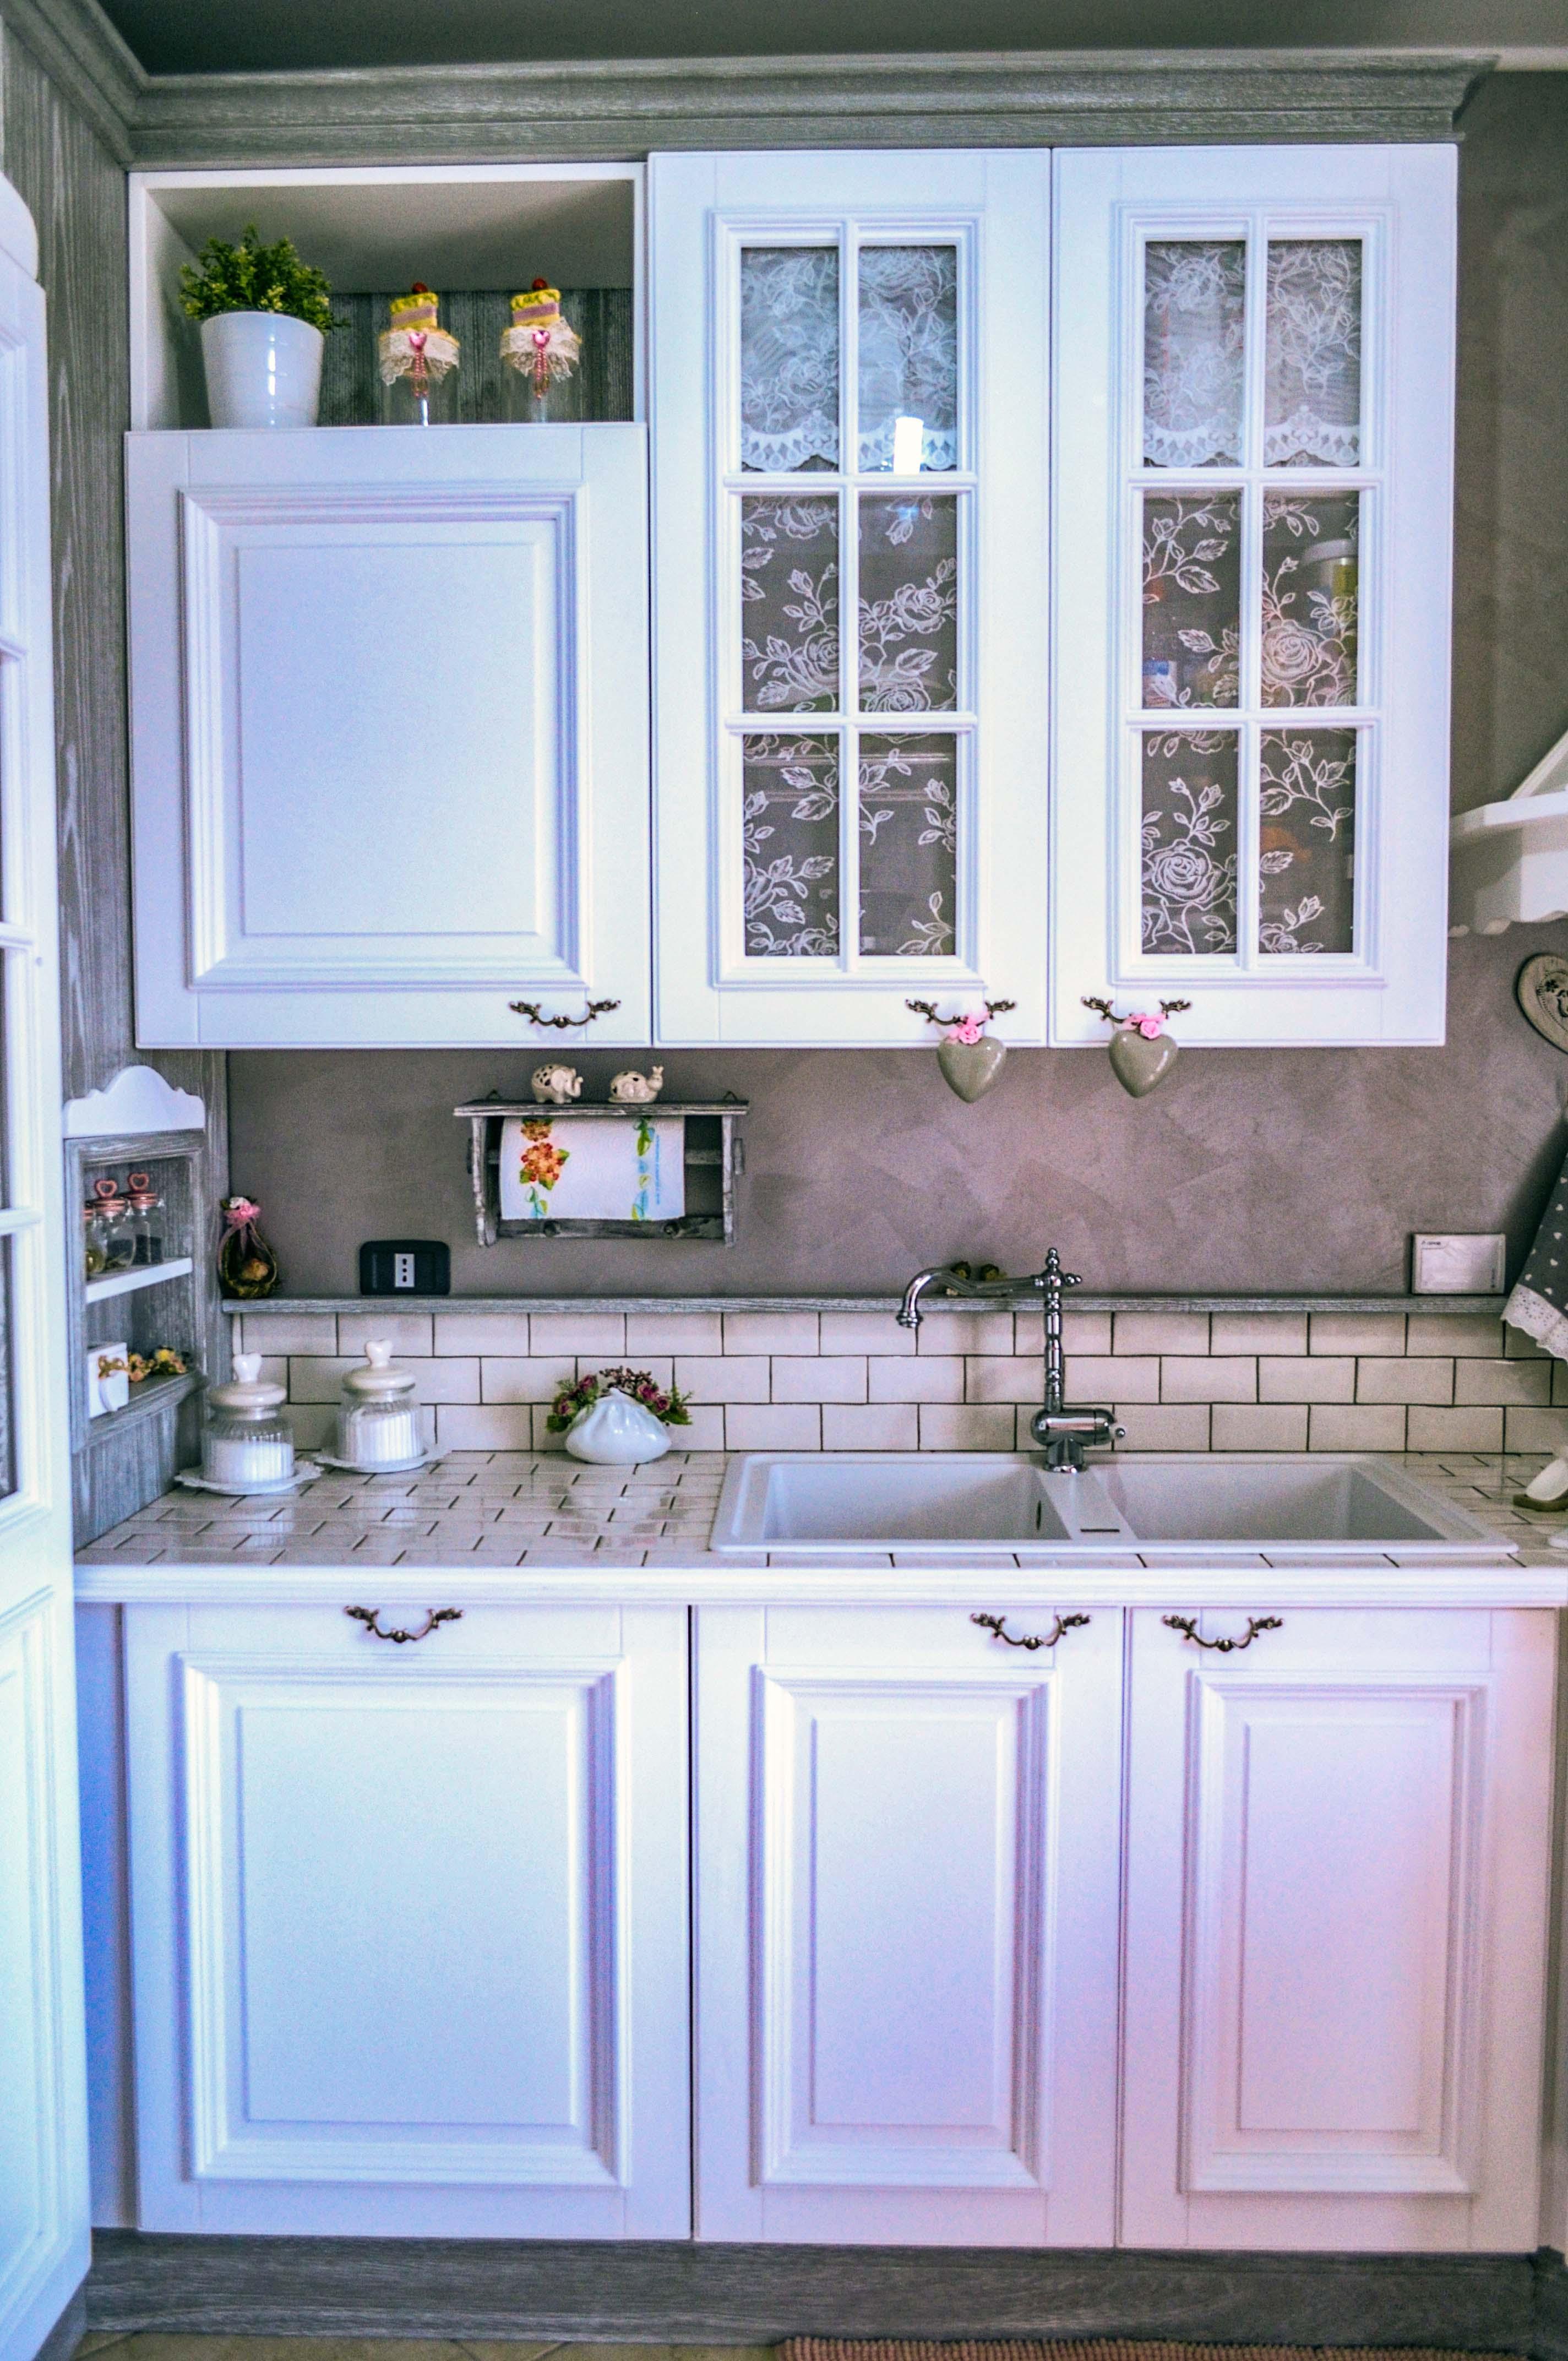 4-cucina shabby chic-su misura- cucina i